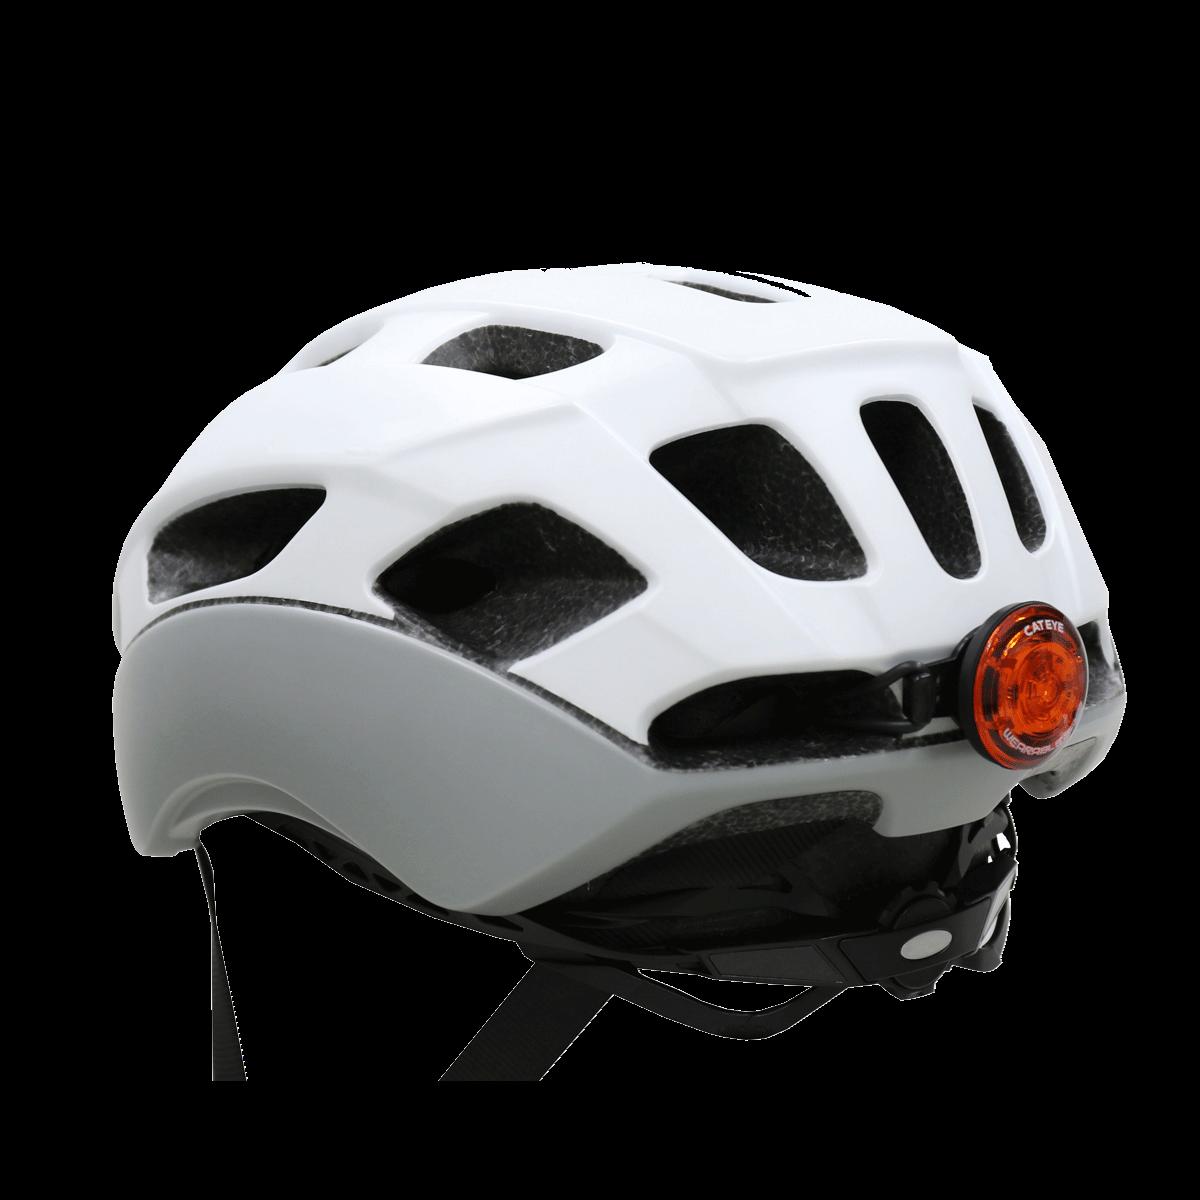 The Cateye Wearable Mini Light